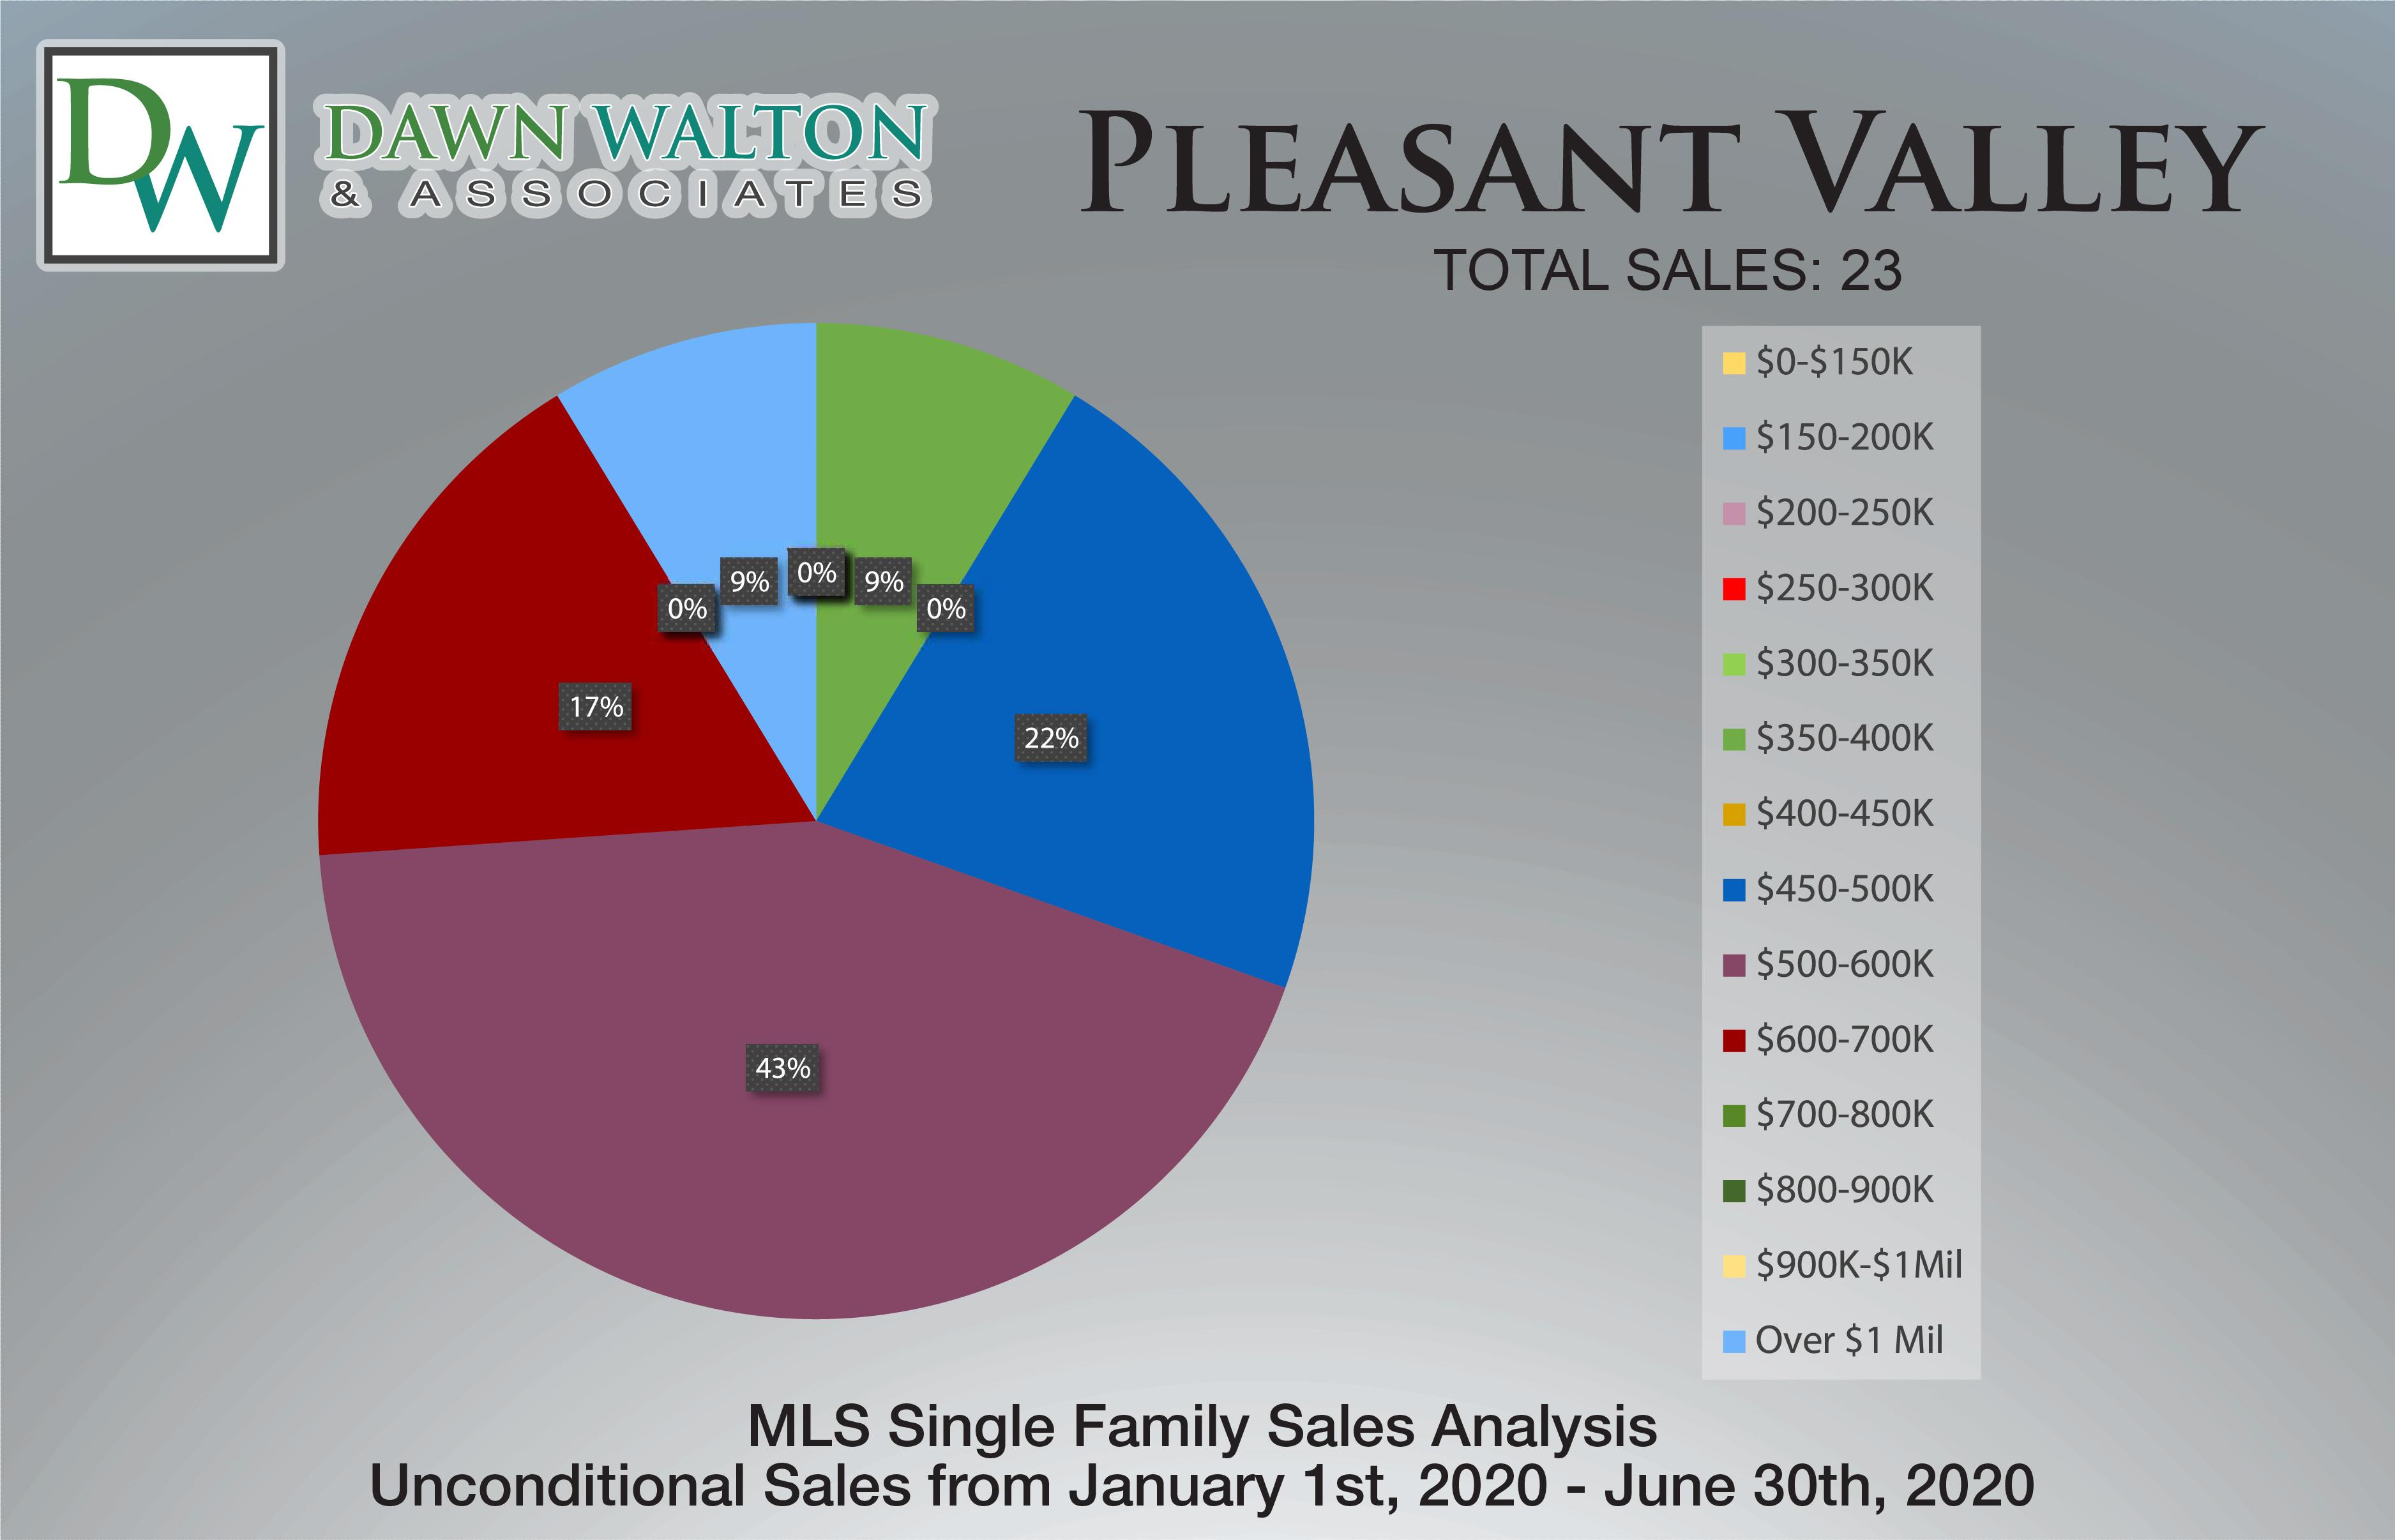 Pleasant Valley Real Estate Market Stats Price Percentage Jan 1- June 30th  2020 - Nanaimo Realtor Dawn Walton